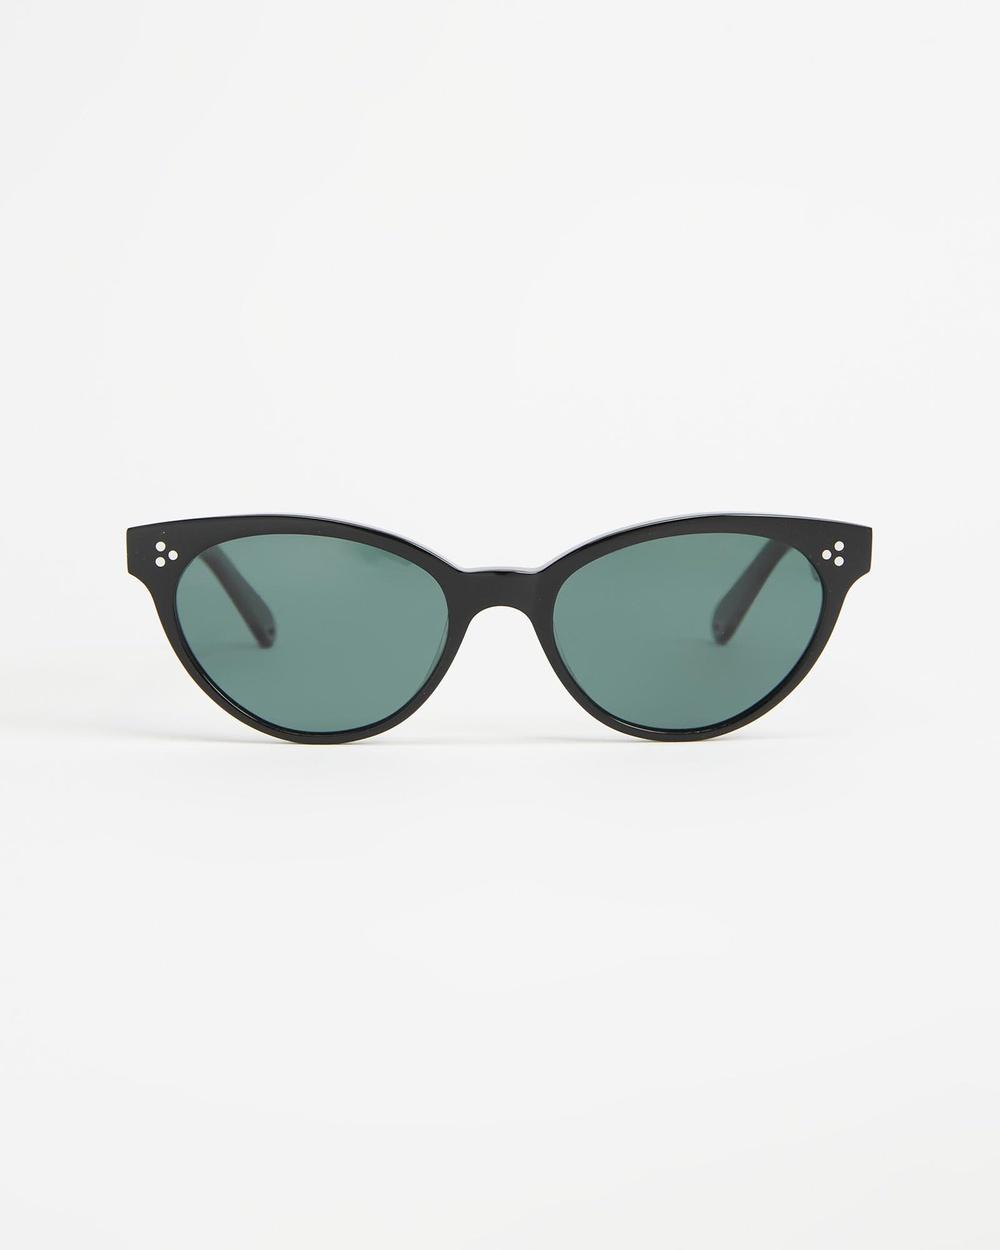 Pacifico Optical Francis Sunglasses Black & Polarised Green